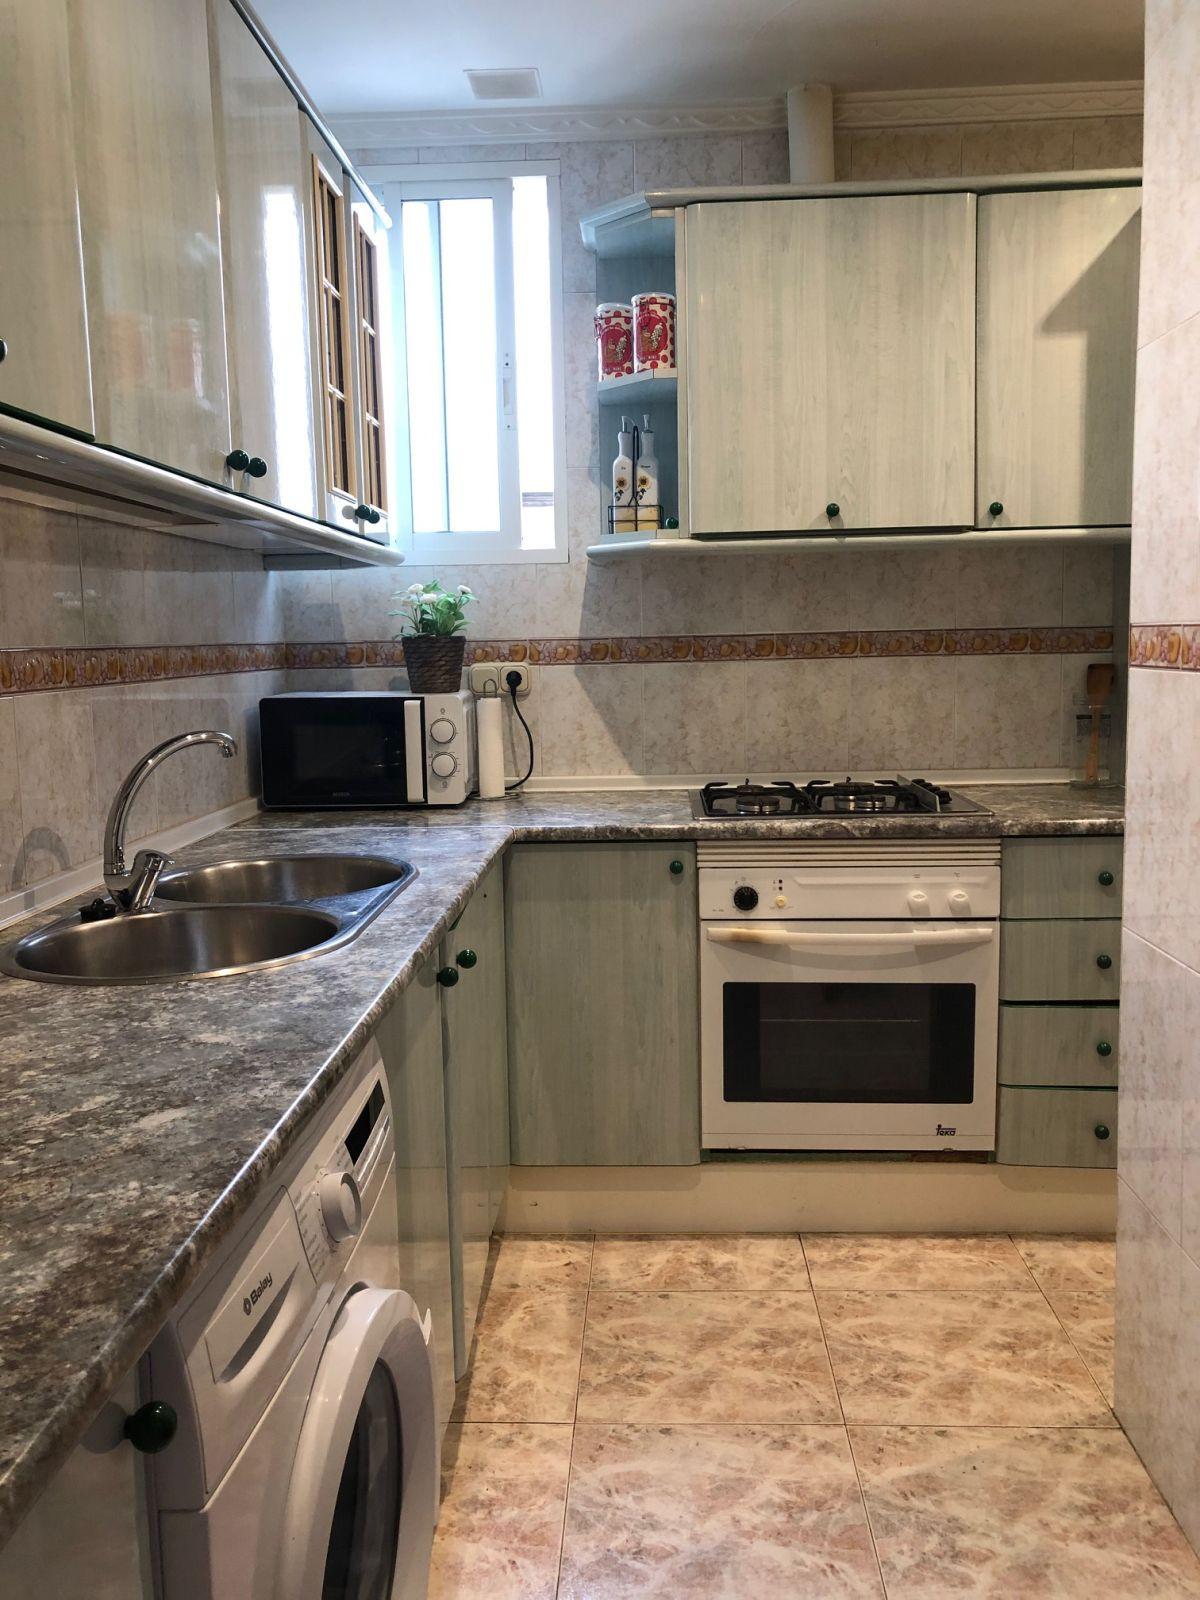 Appartement Penthouse à Torremolinos Centro, Costa del Sol